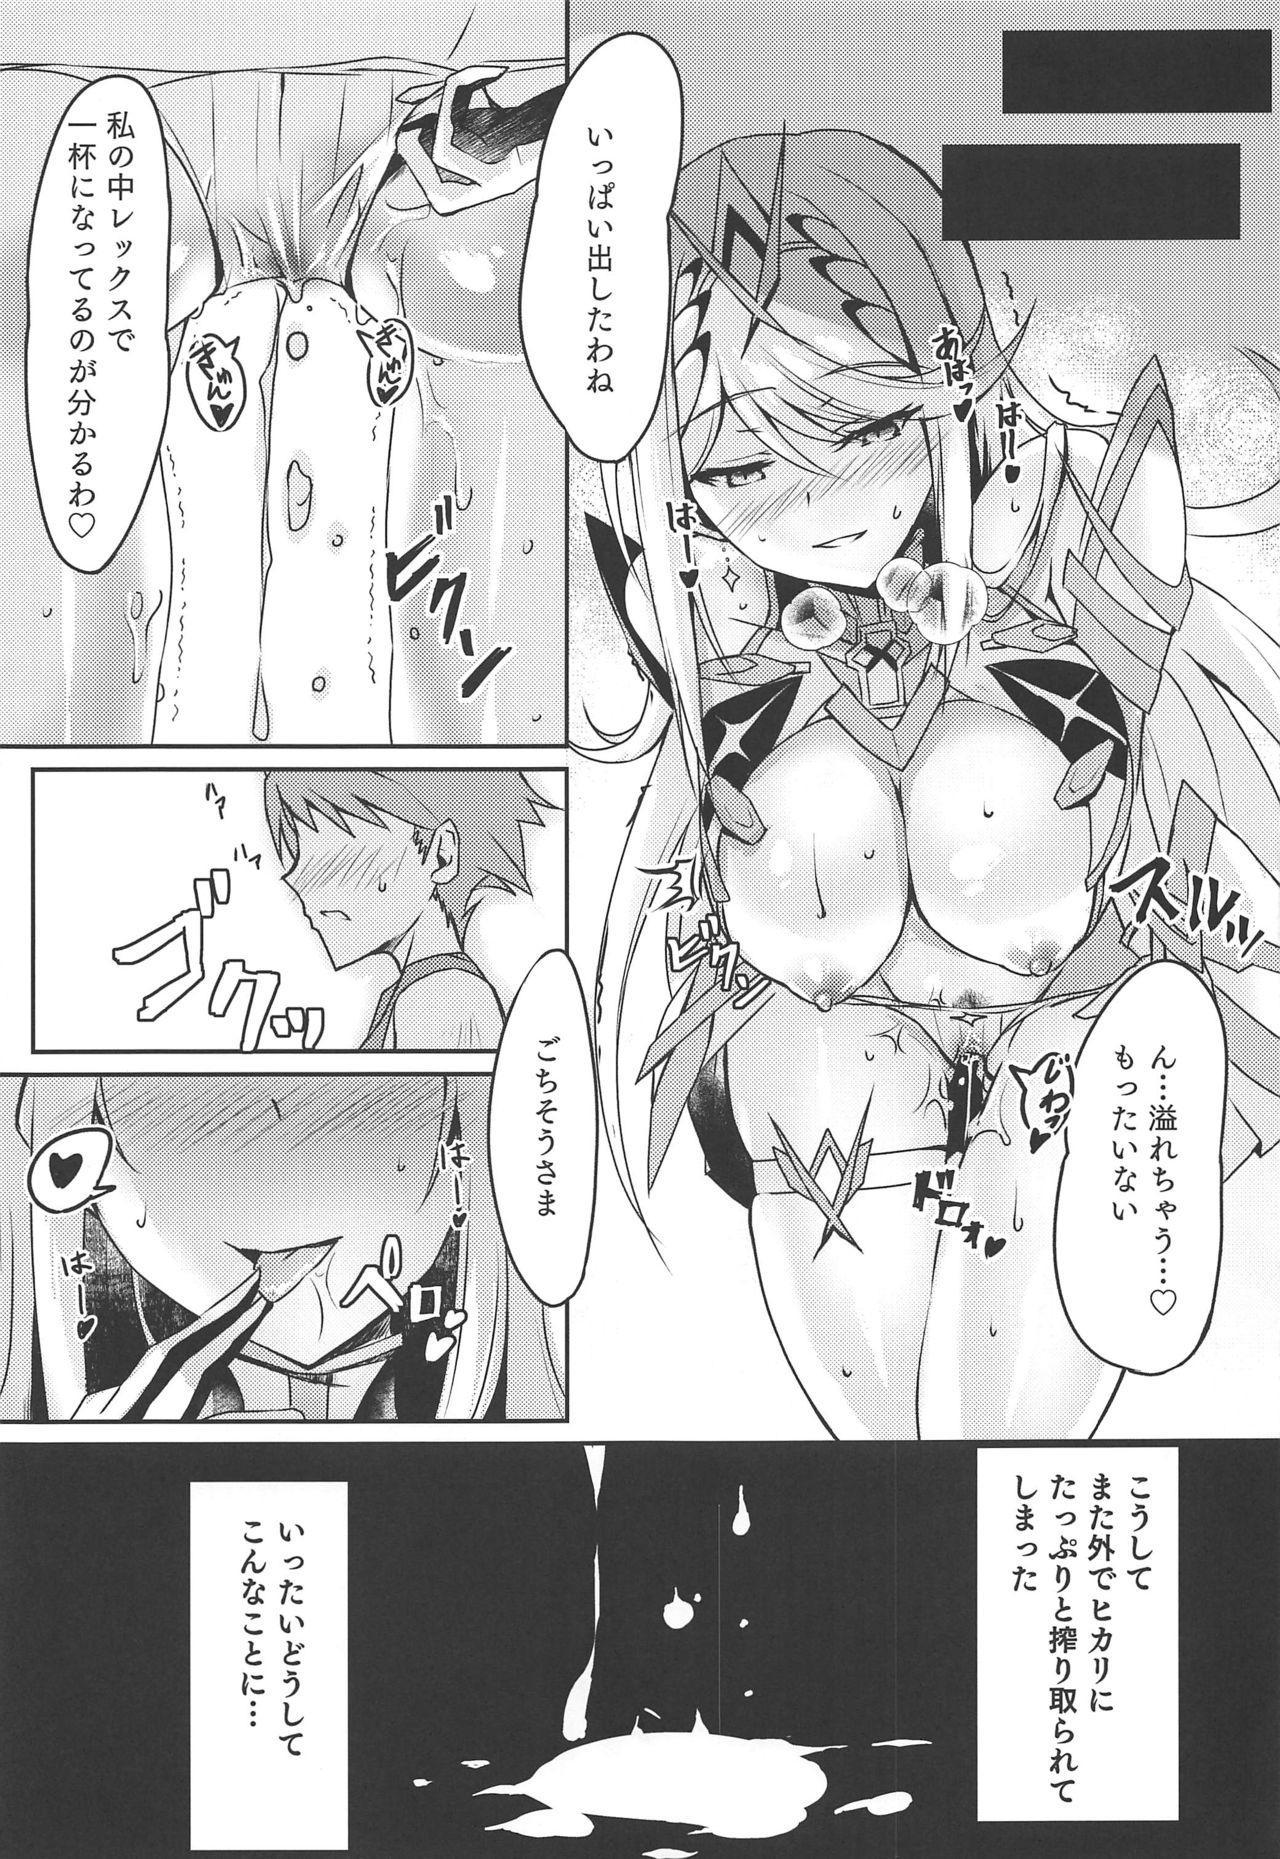 Hikari-chan no Ecchi Hon 7